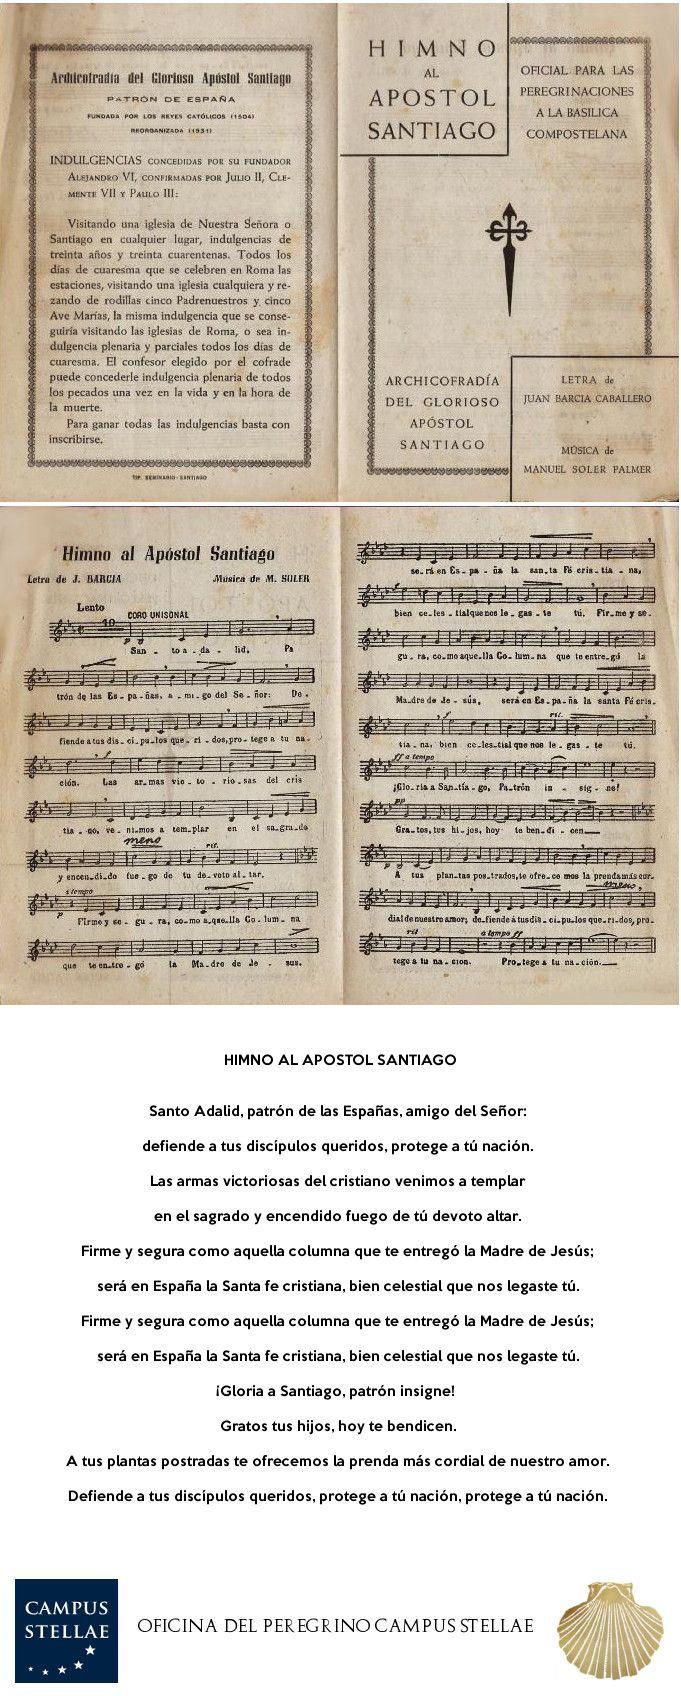 Himno de Santiago Apostol   Anthem   Hymne   Centro del Peregrino CAMPUS STELLAE   Santiago de Compostela   Consigna   Left Luggage   http://www.oficinaperegrinocaminosantiago.com/